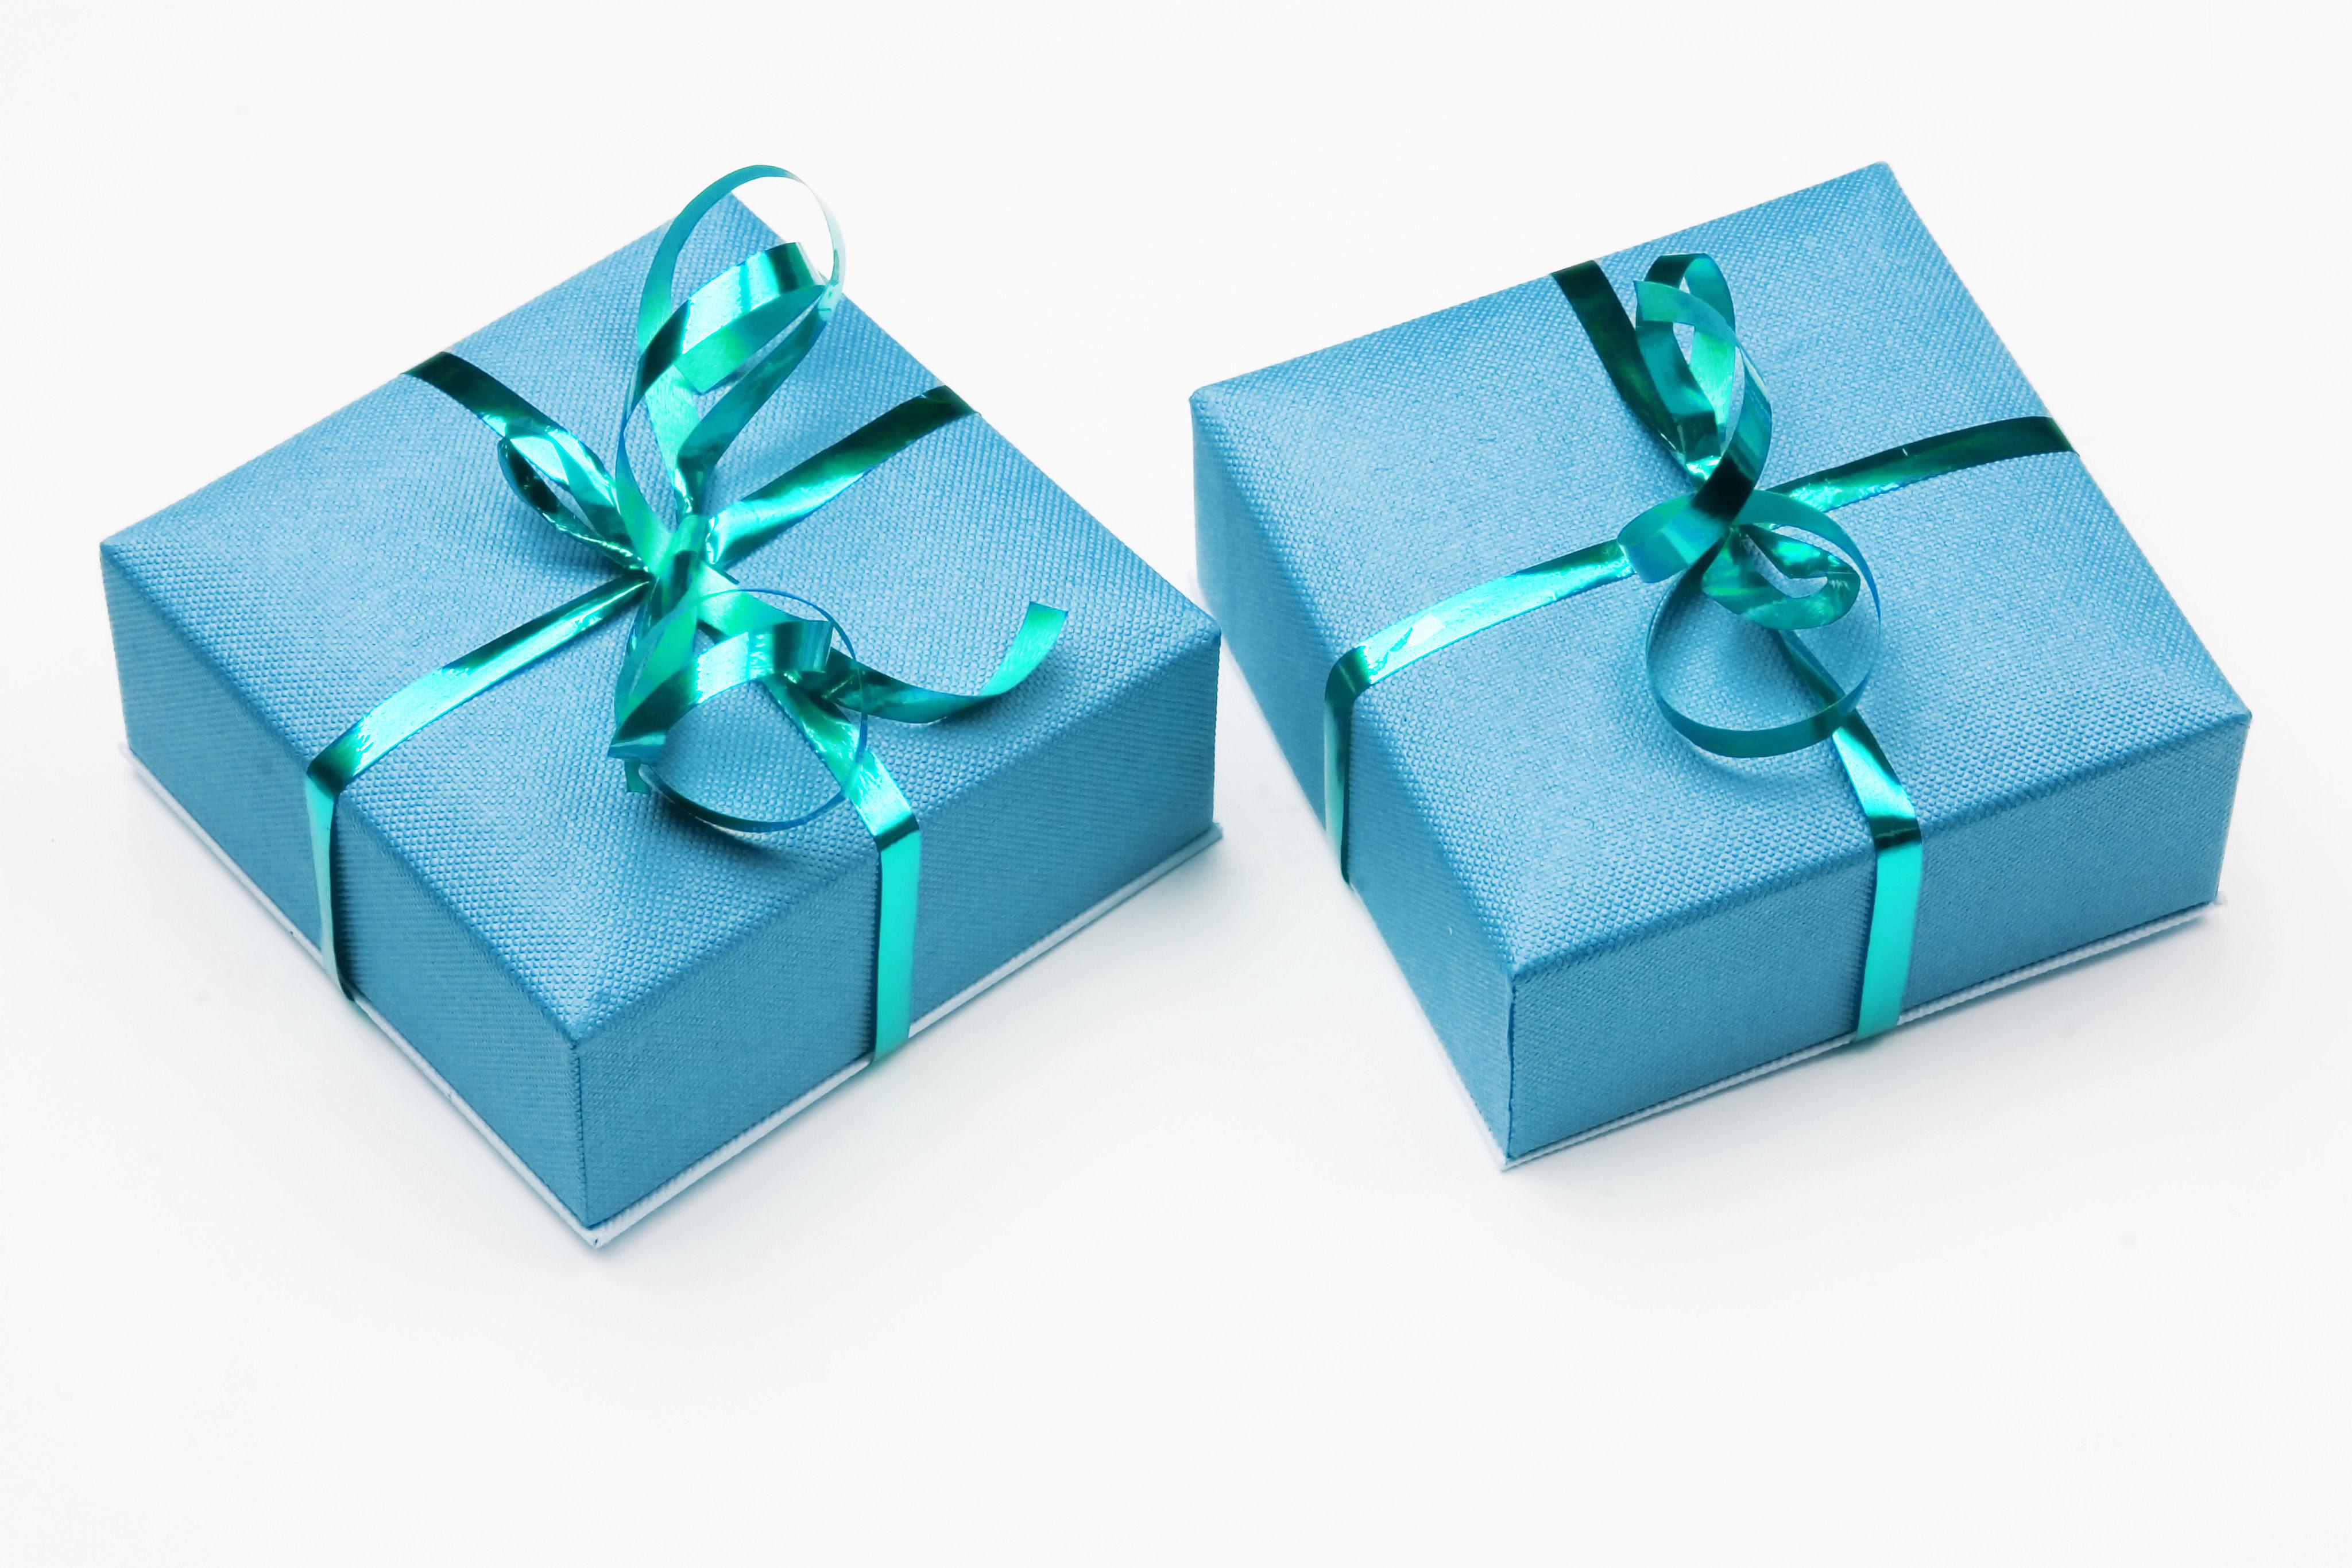 Silver Wedding Gift: Wedding World: Gift Ideas For Silver Wedding Anniversary